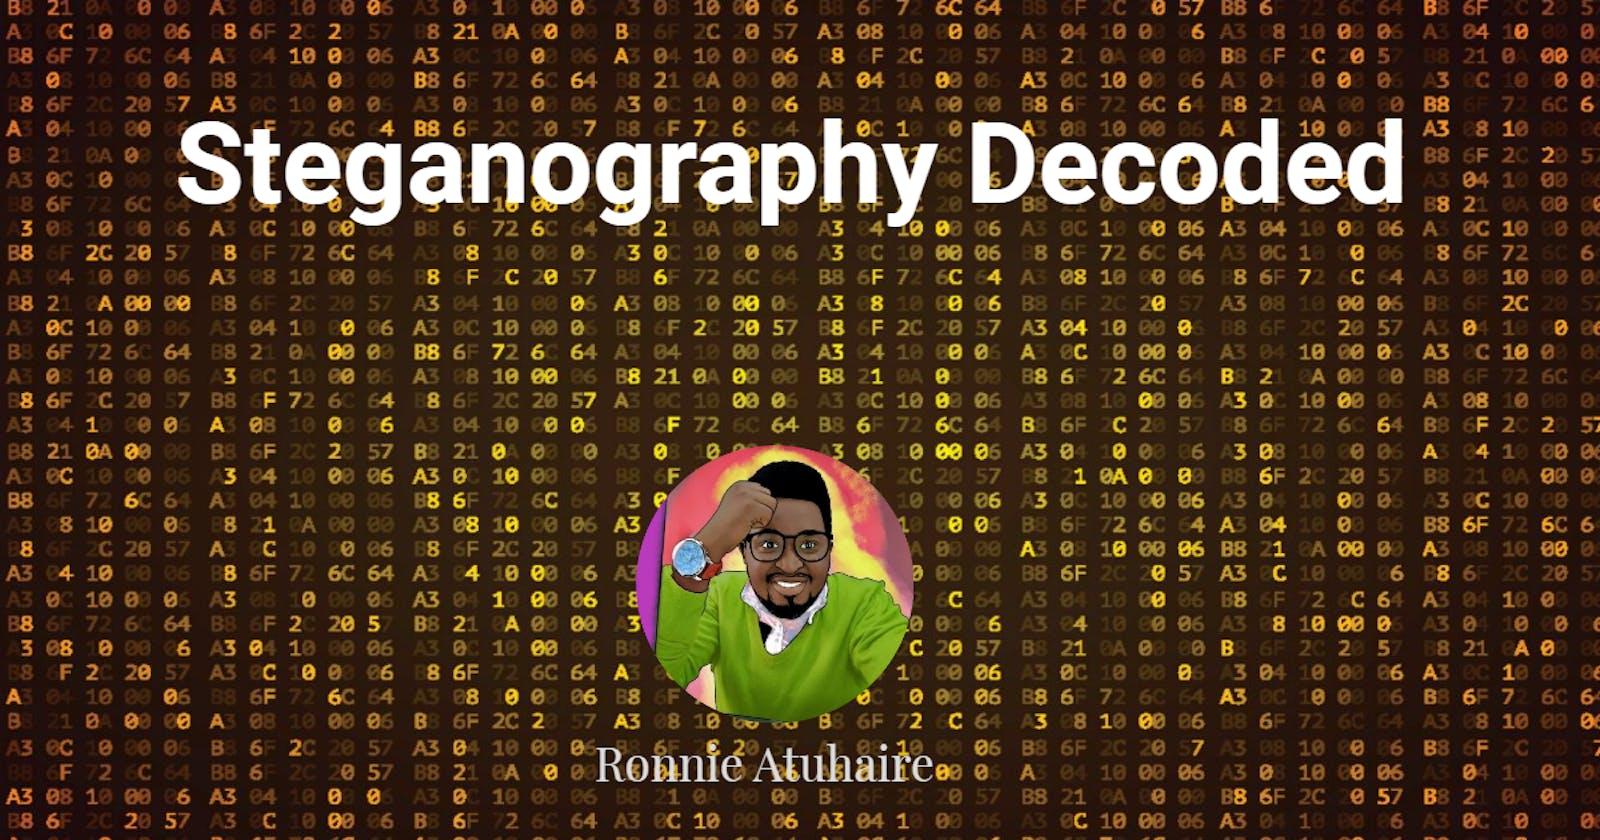 Steganography Decoded